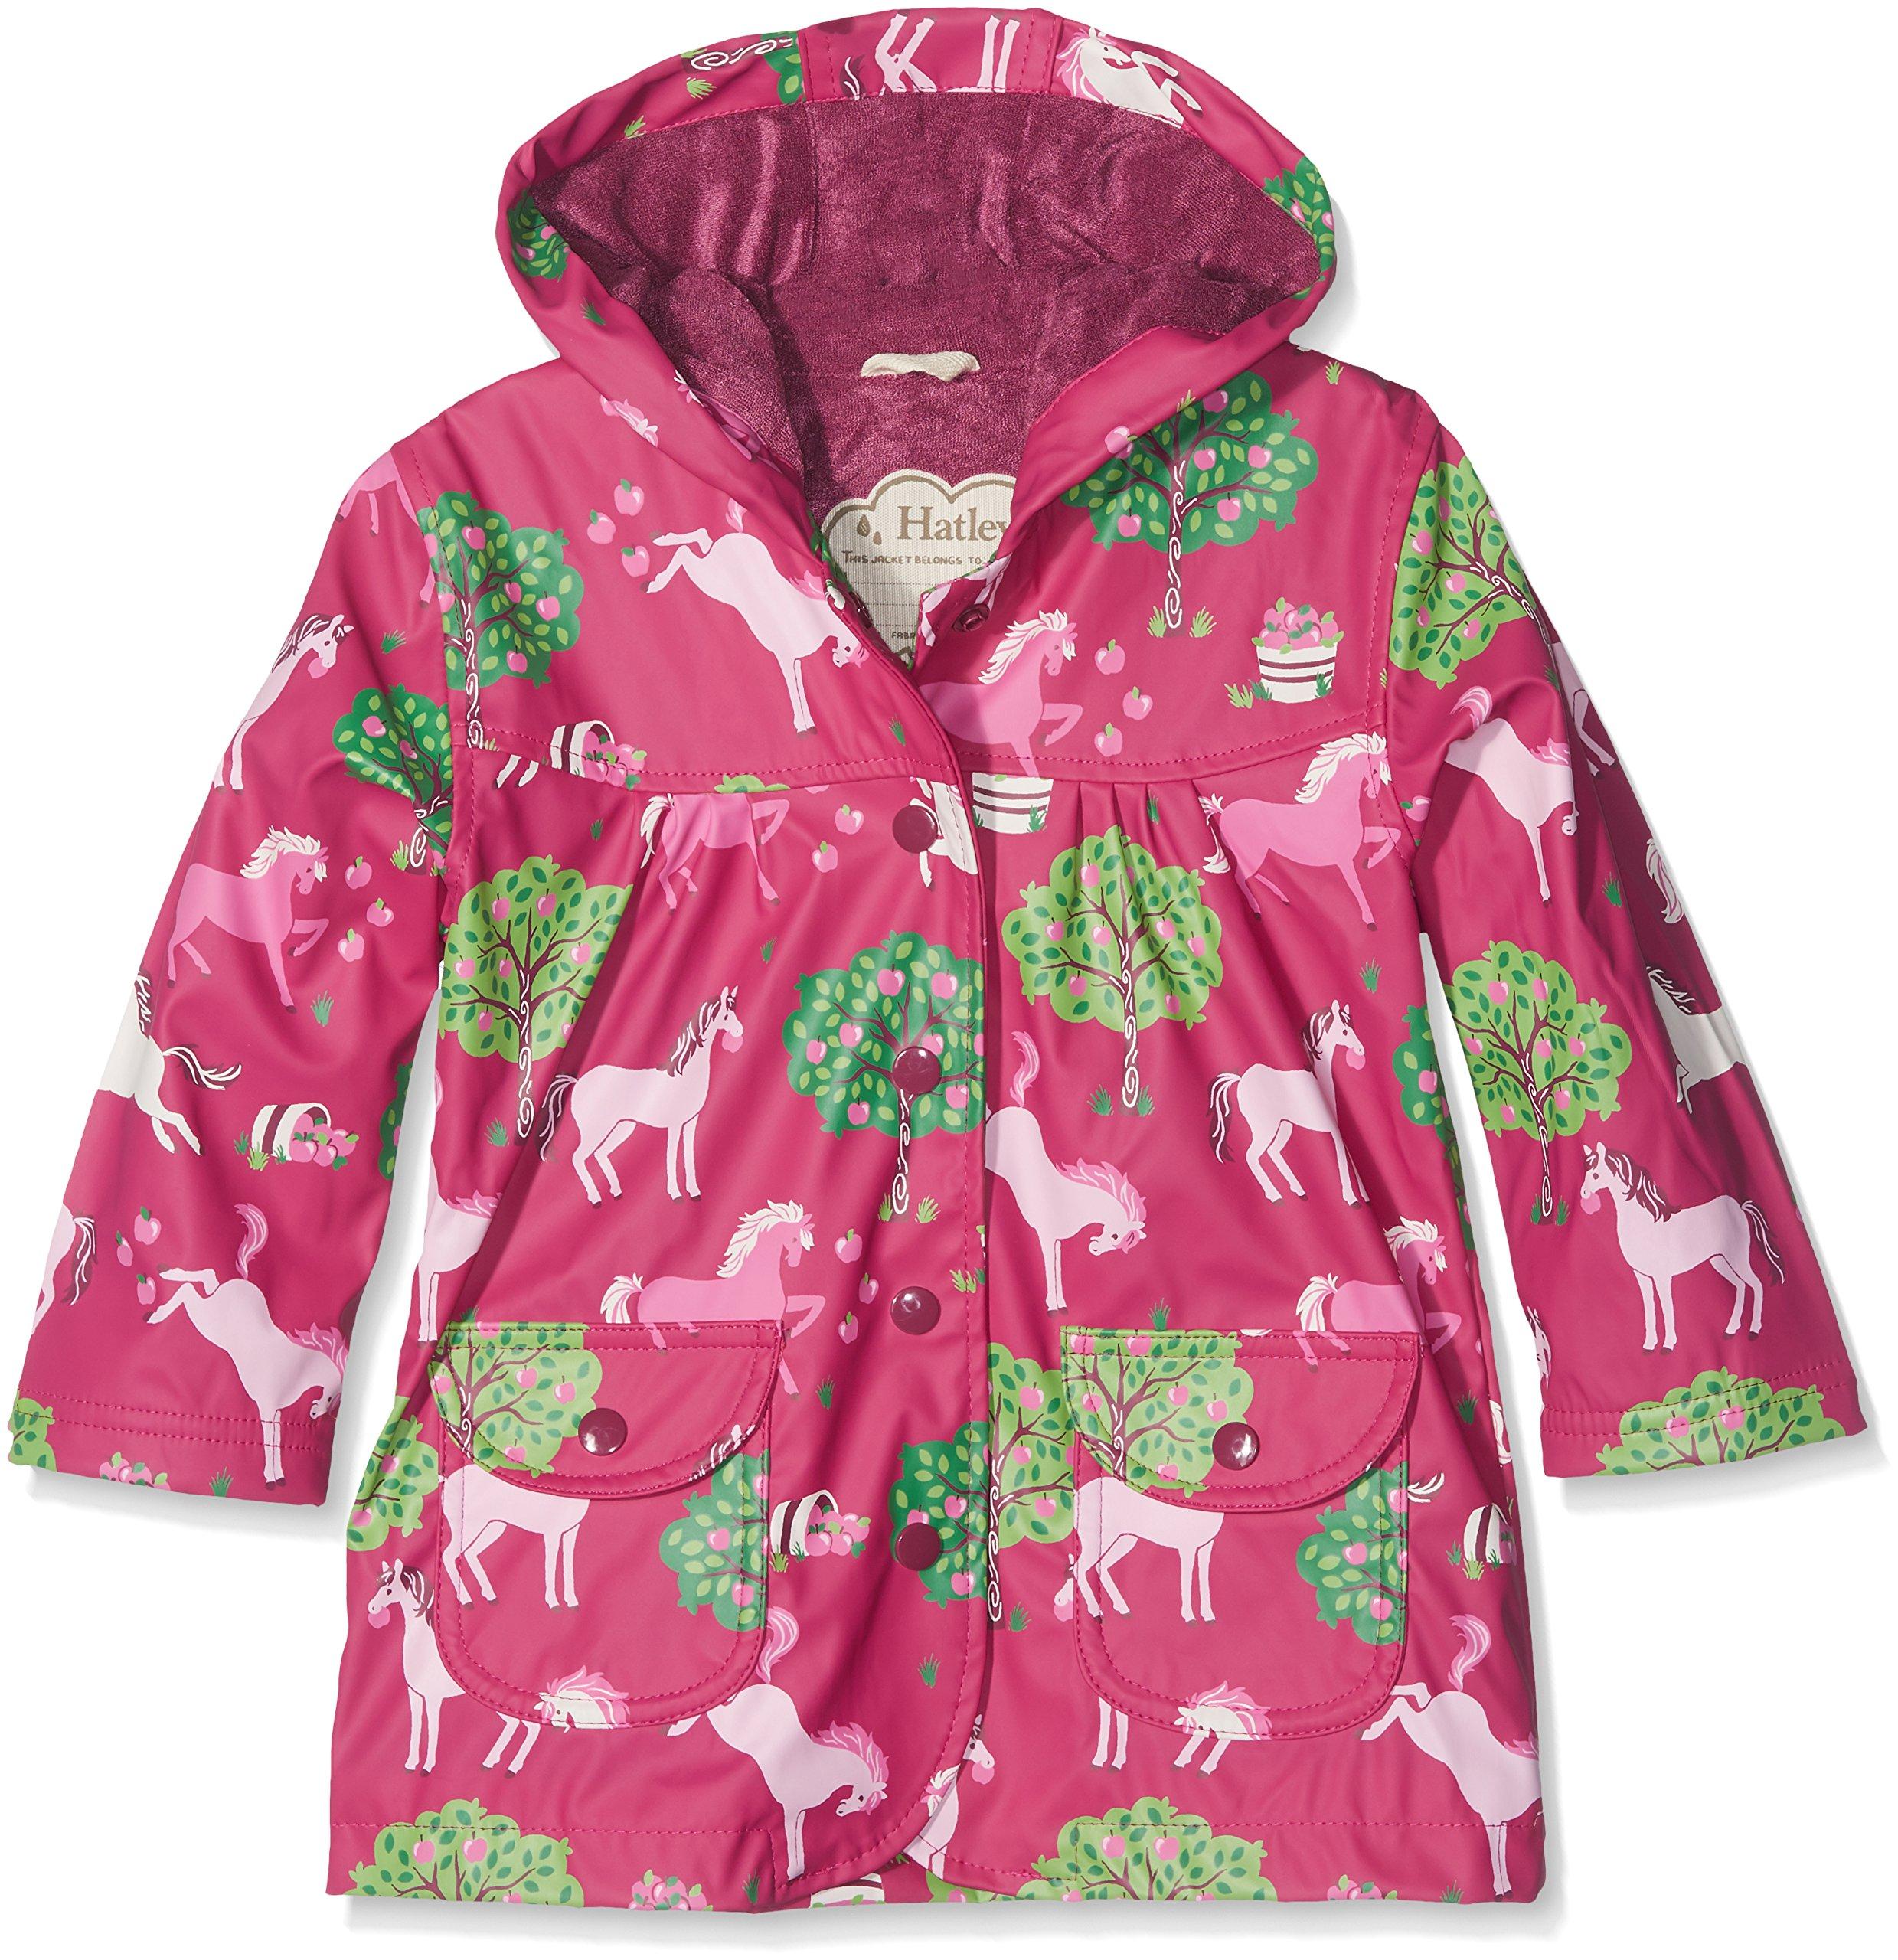 Hatley Big Girls' Printed Raincoats, Pony Orchard, 7